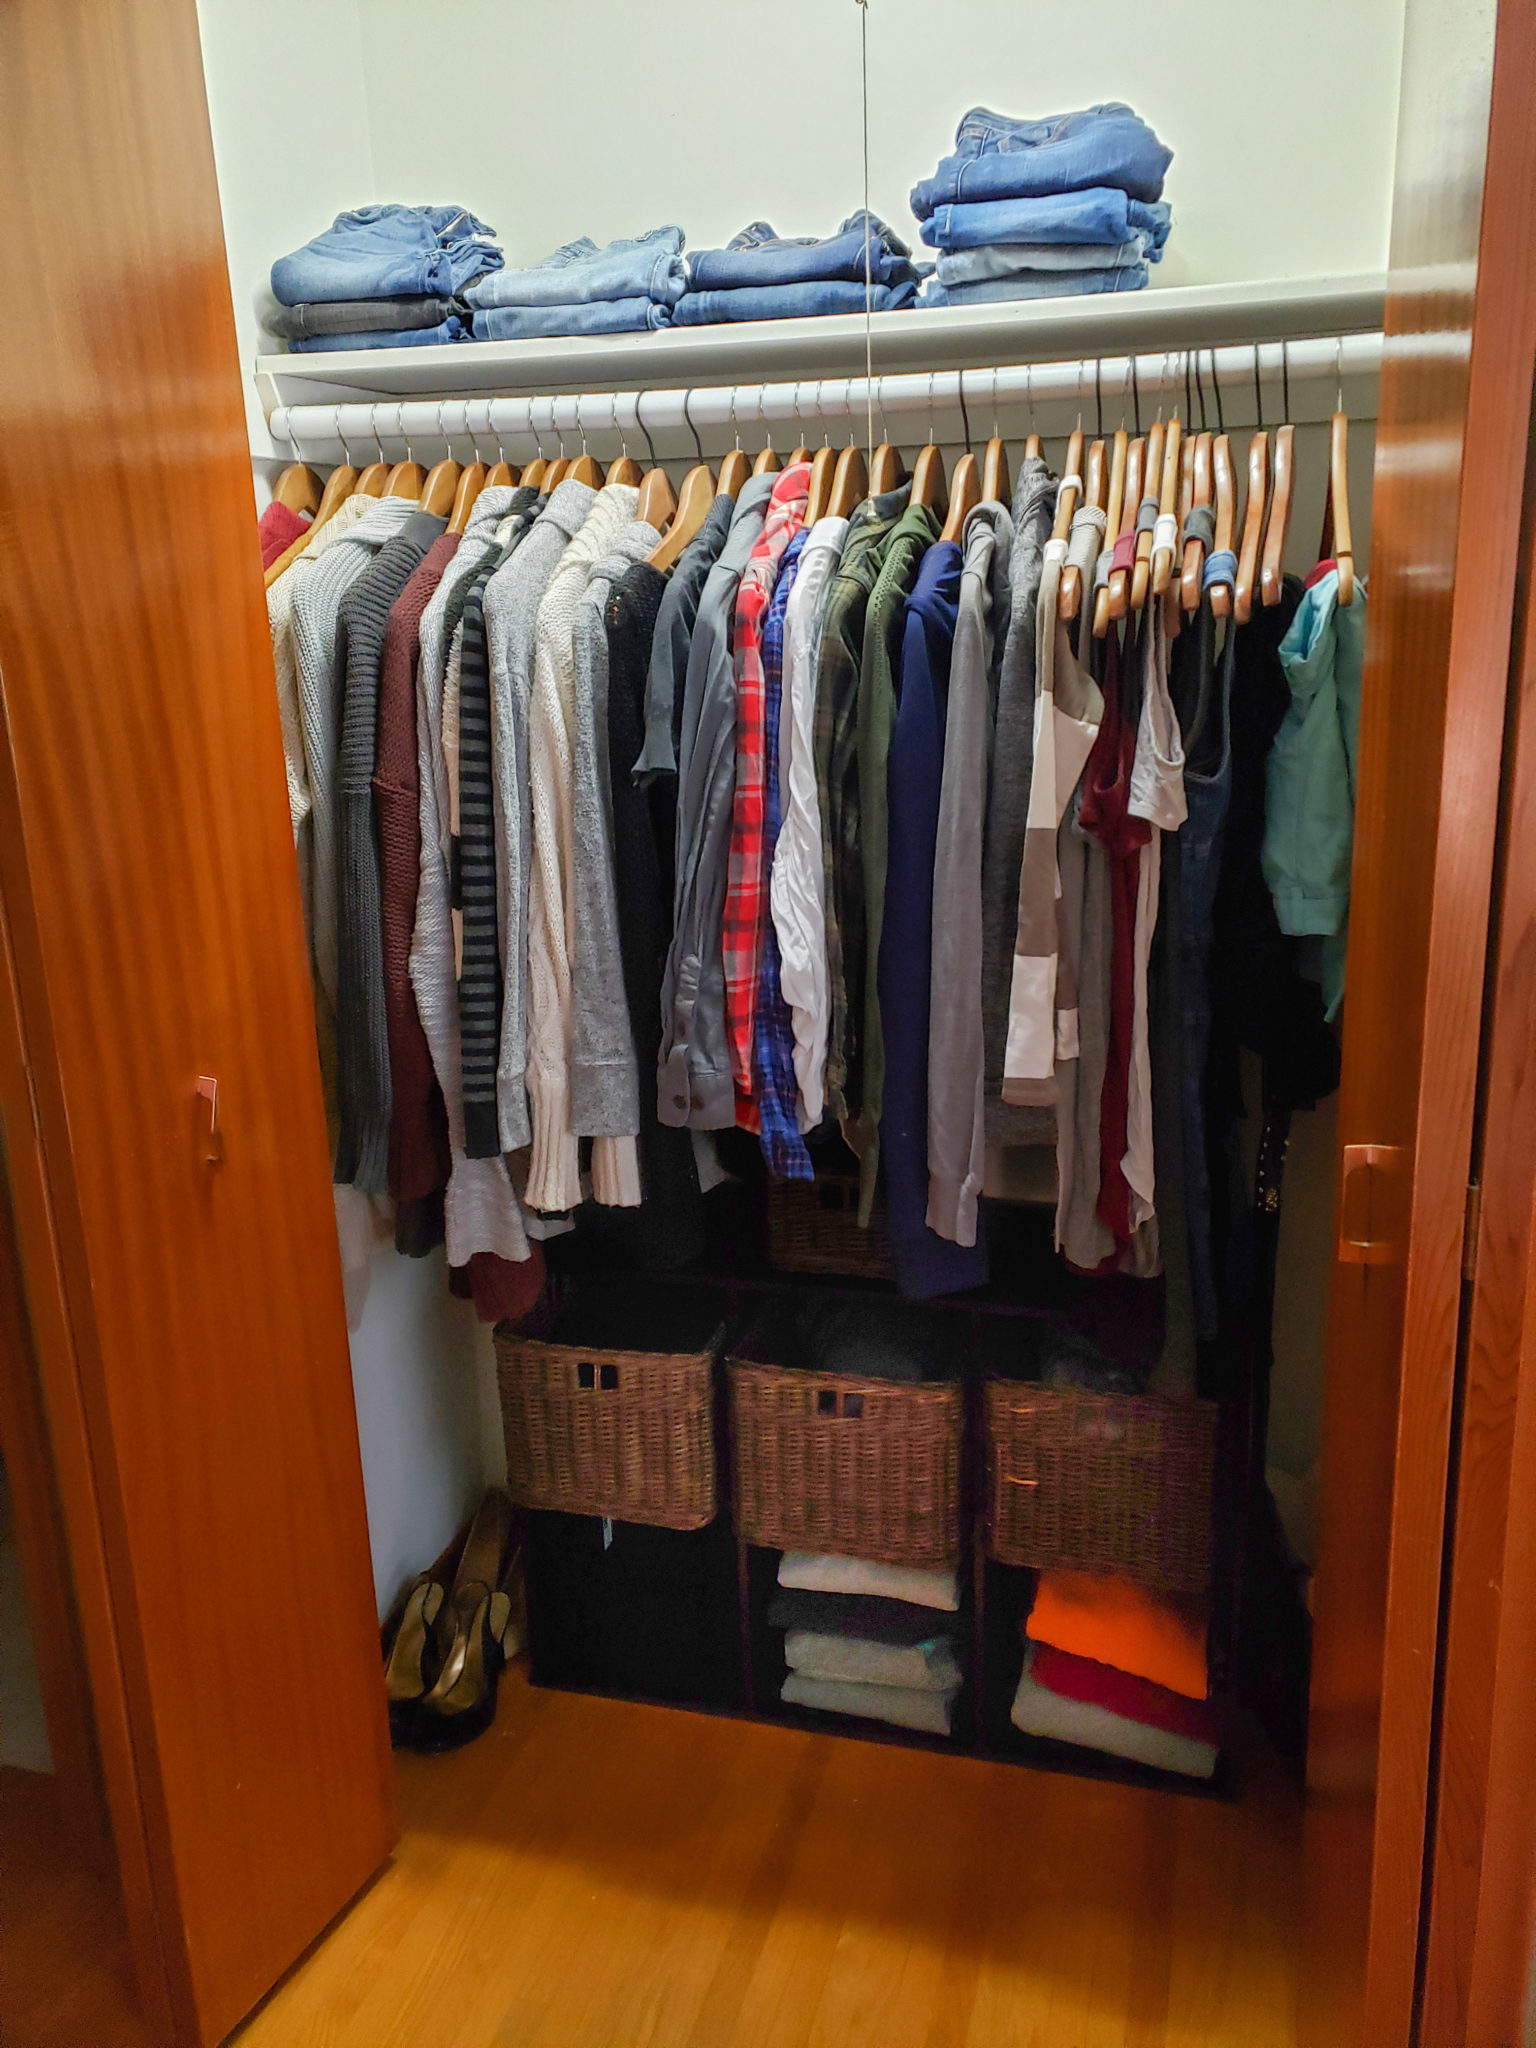 Bedroom closet - After